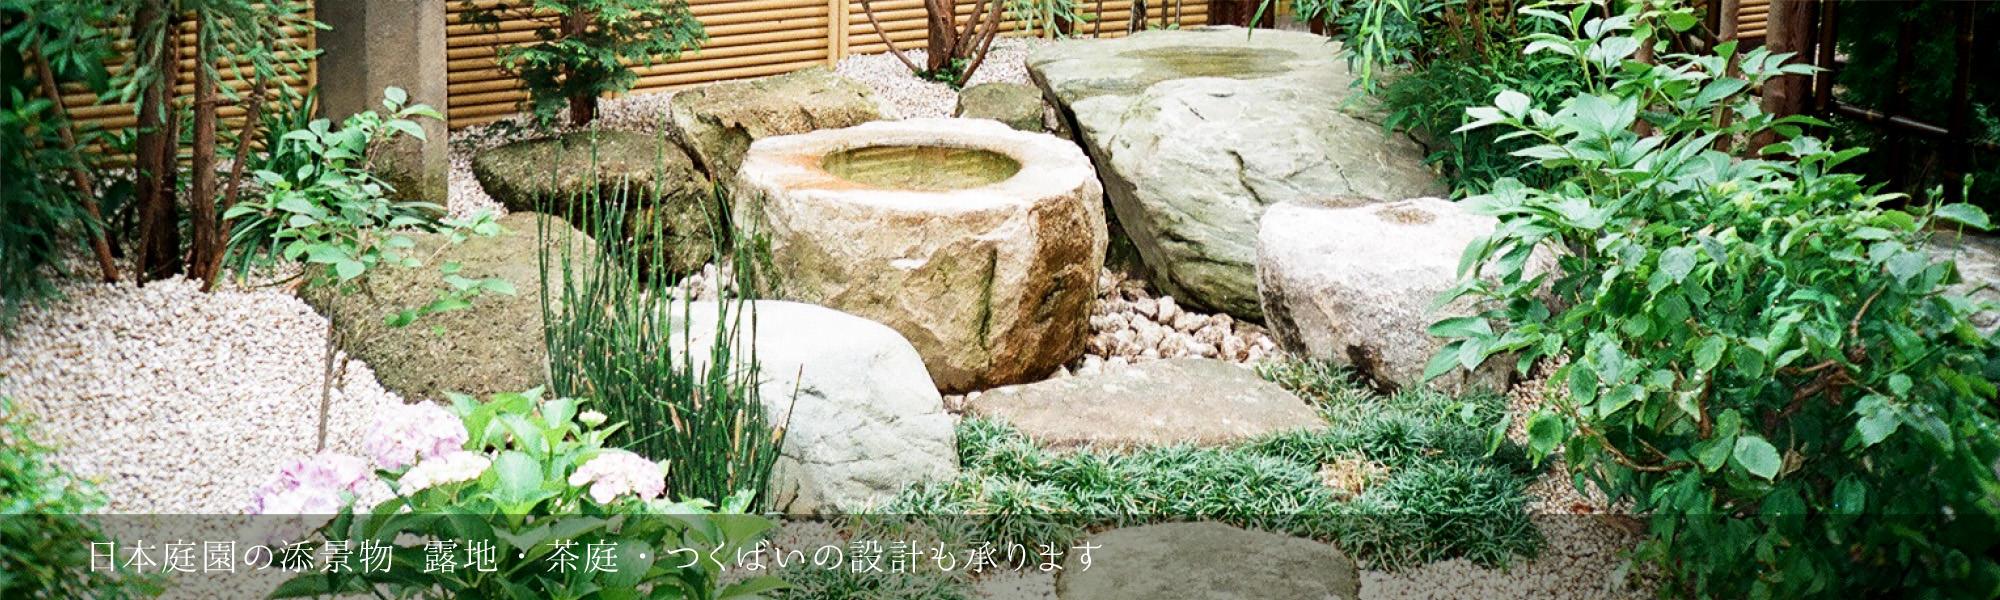 <a href='http://yakigaya-zouen.com/archives/663'></a>